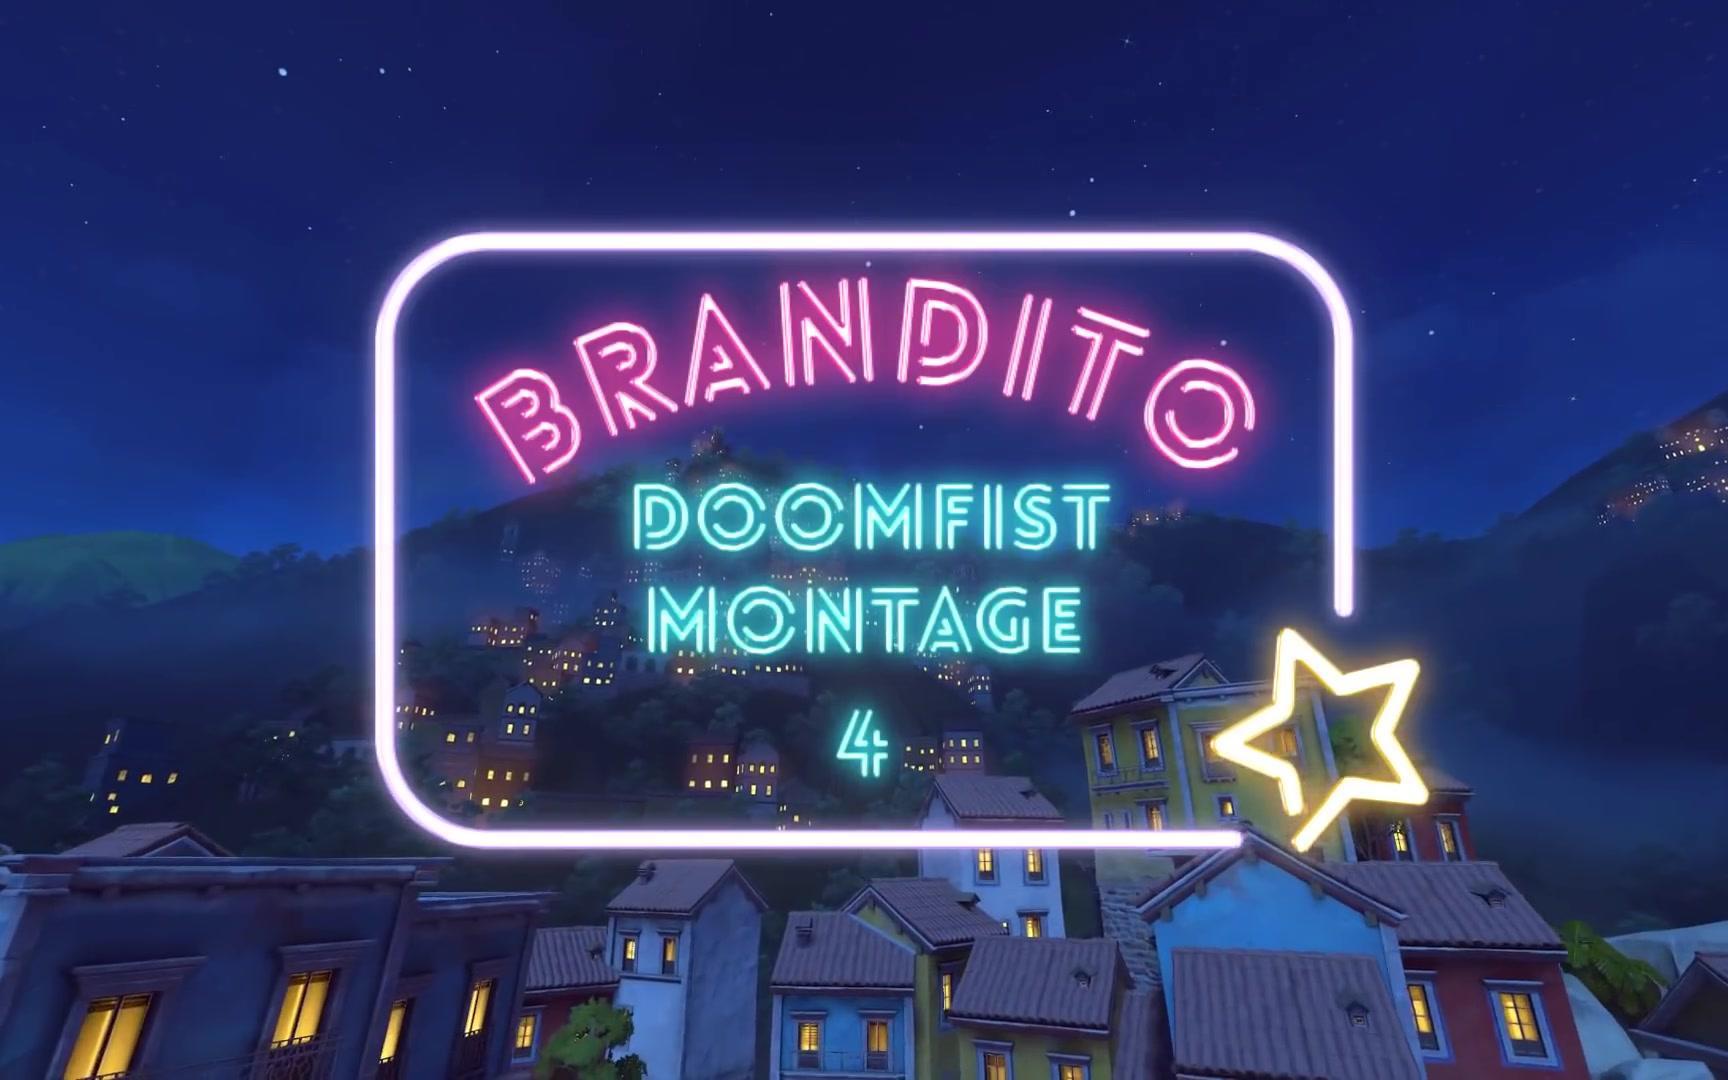 【Brandito】守望先锋 北美对空铁拳brandito天梯集锦 1-6期